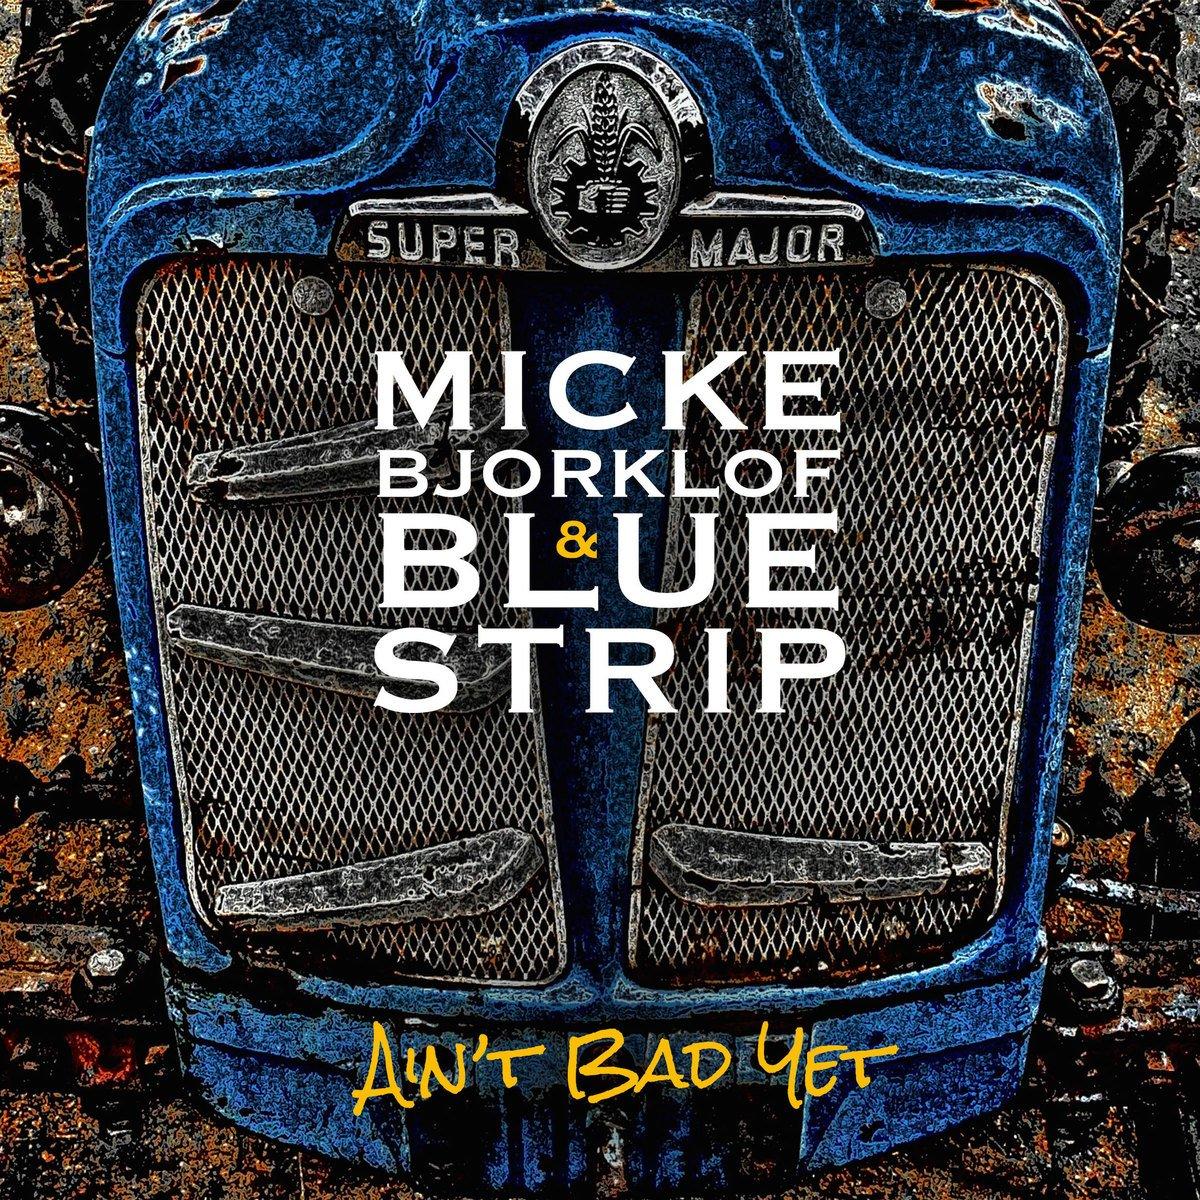 MICKE BJORKLOF & BLUE STRIP Ain't Bad Yet